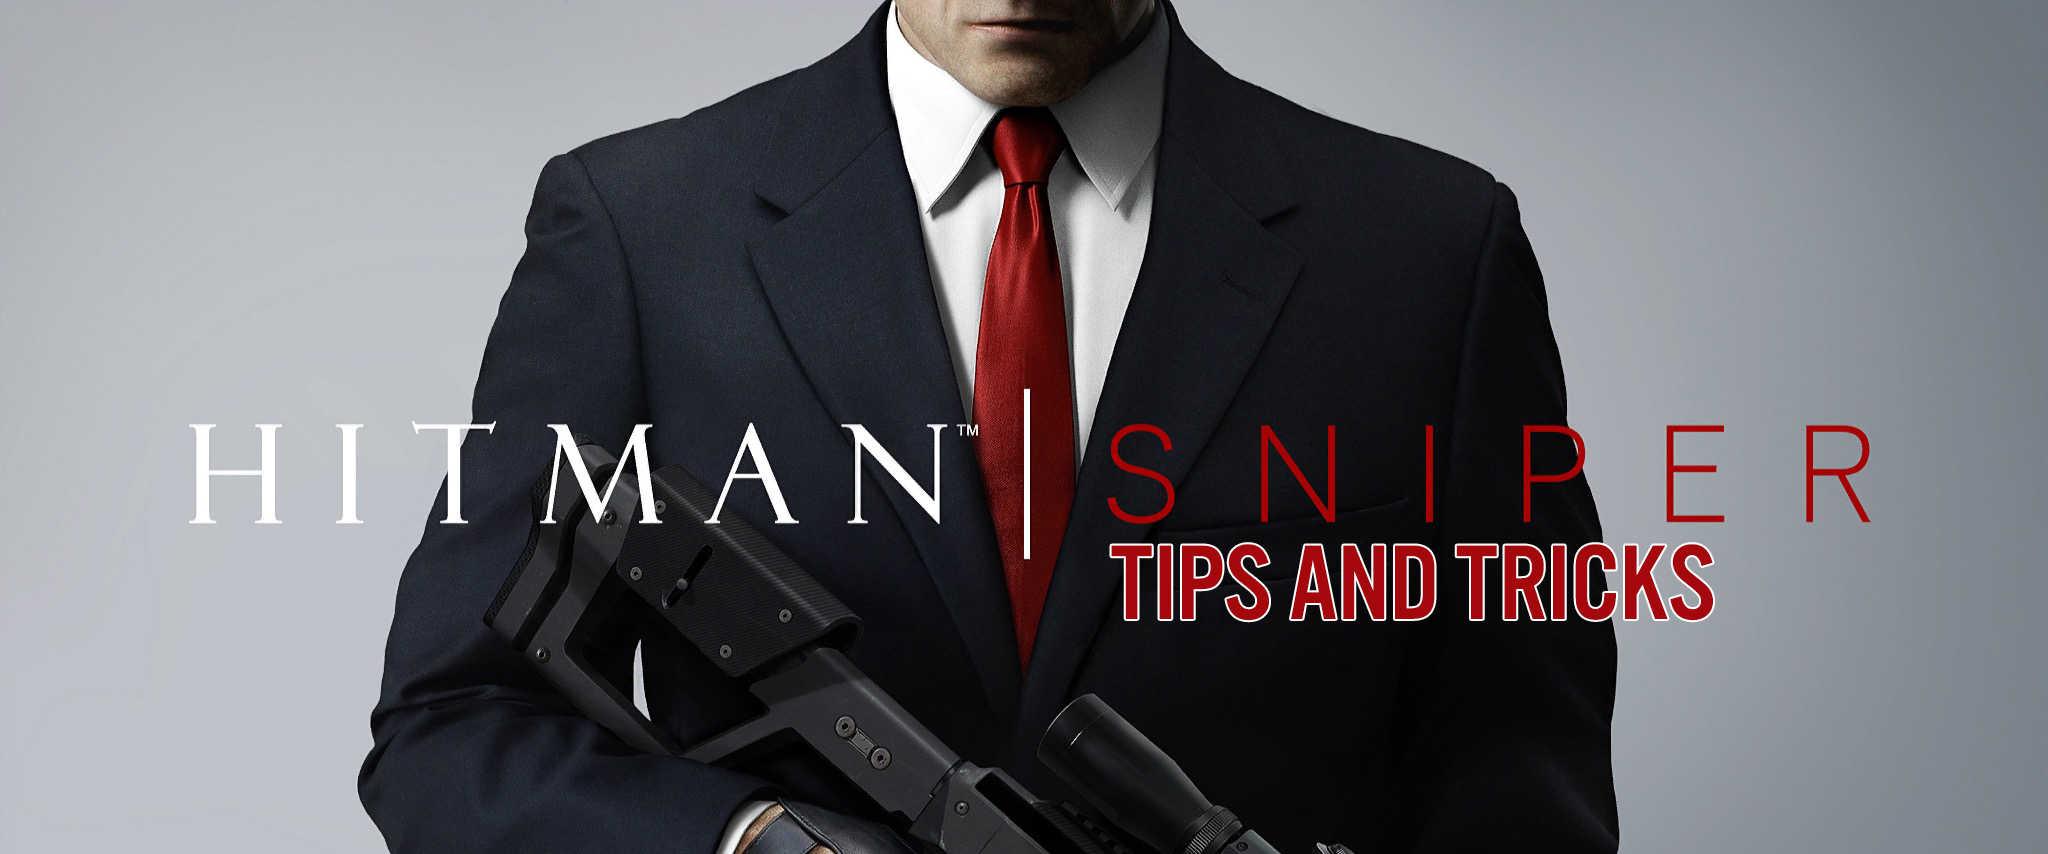 Hitman: Sniper -- Tips & Tricks on